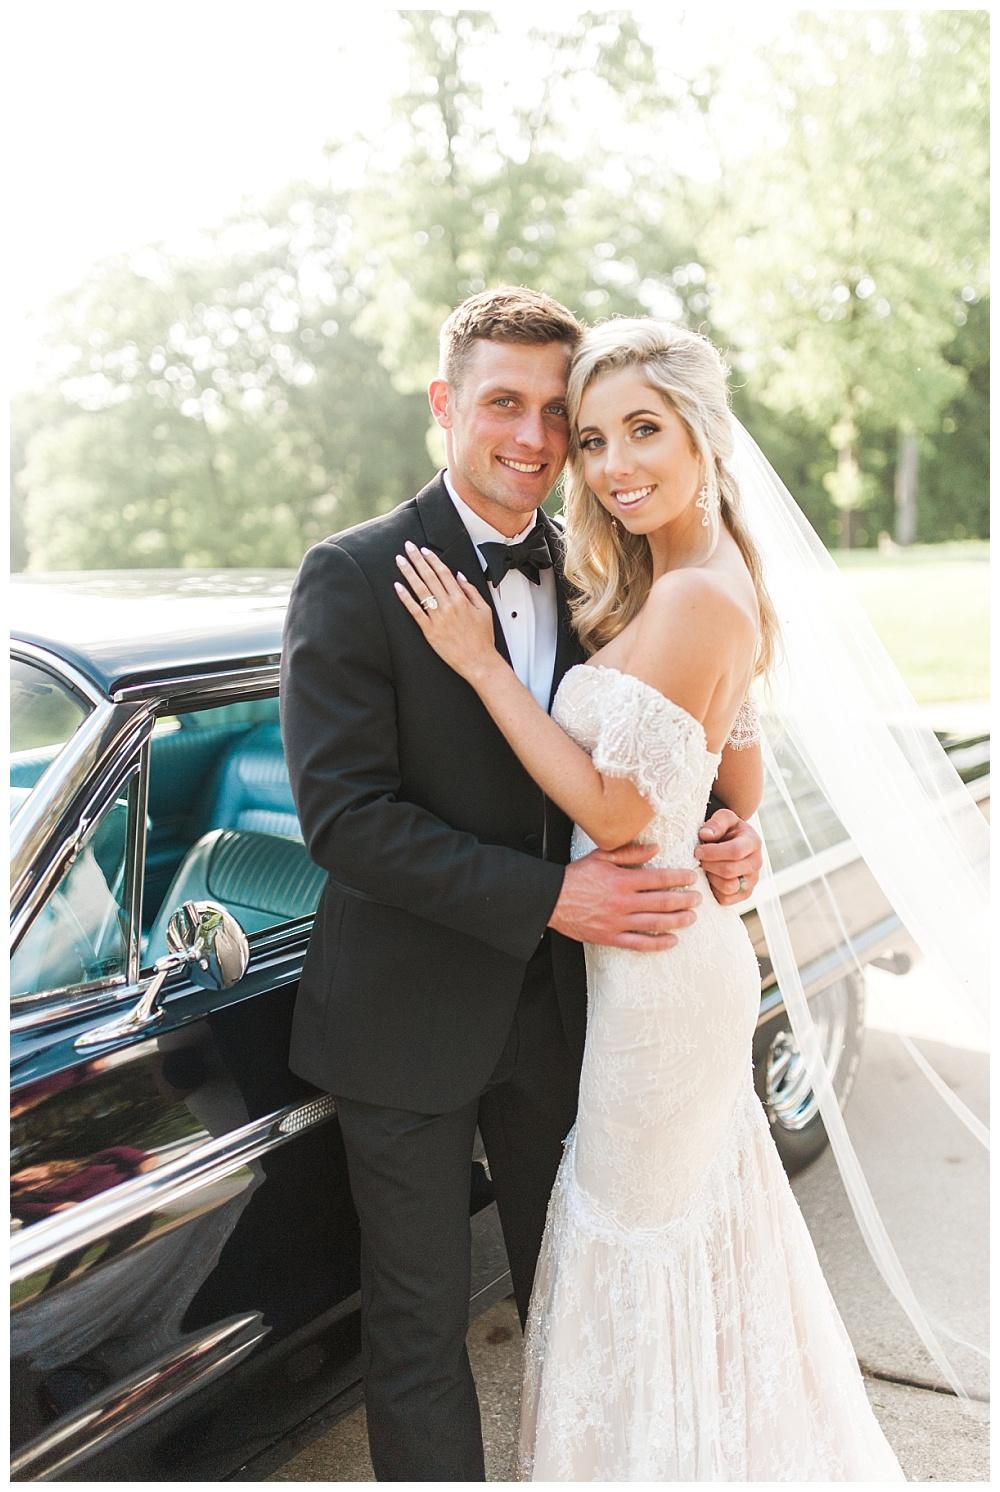 Stephanie Marie Photography TPC Deere Run Quad Cities Iowa City Wedding Photographer Ben Erin Dittmer_0059.jpg